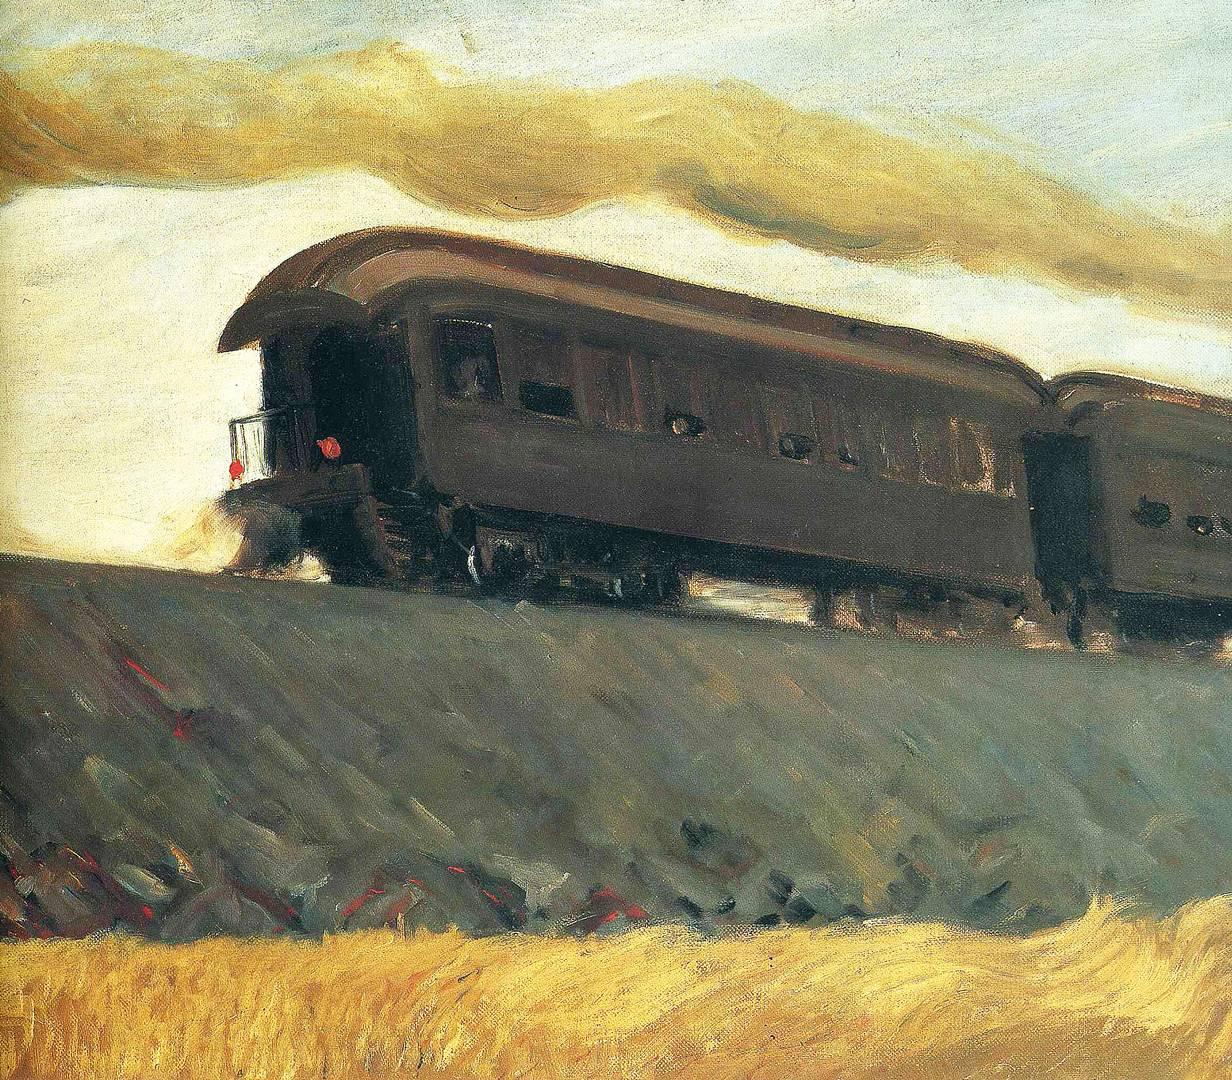 Эдвард Хоппер. Железнодорожный состав. 1908